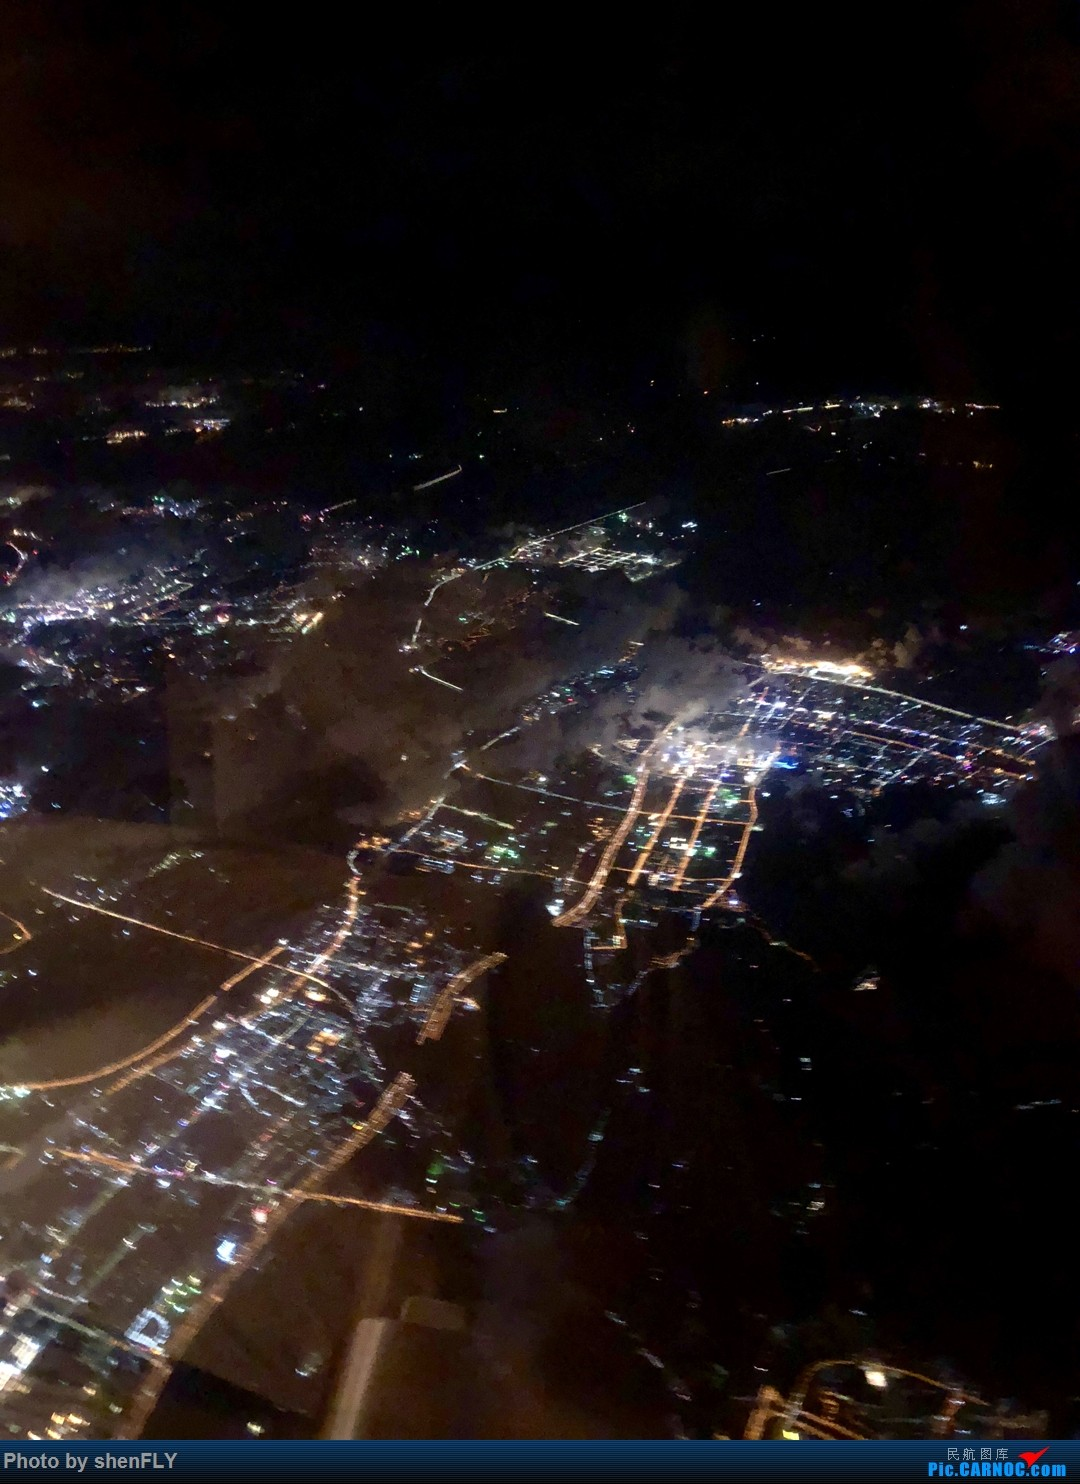 Re:[原创]伴随夕阳起飞,回忆最后一次搭乘厦航757飞行 BOEING 757-200 B-2869 空中